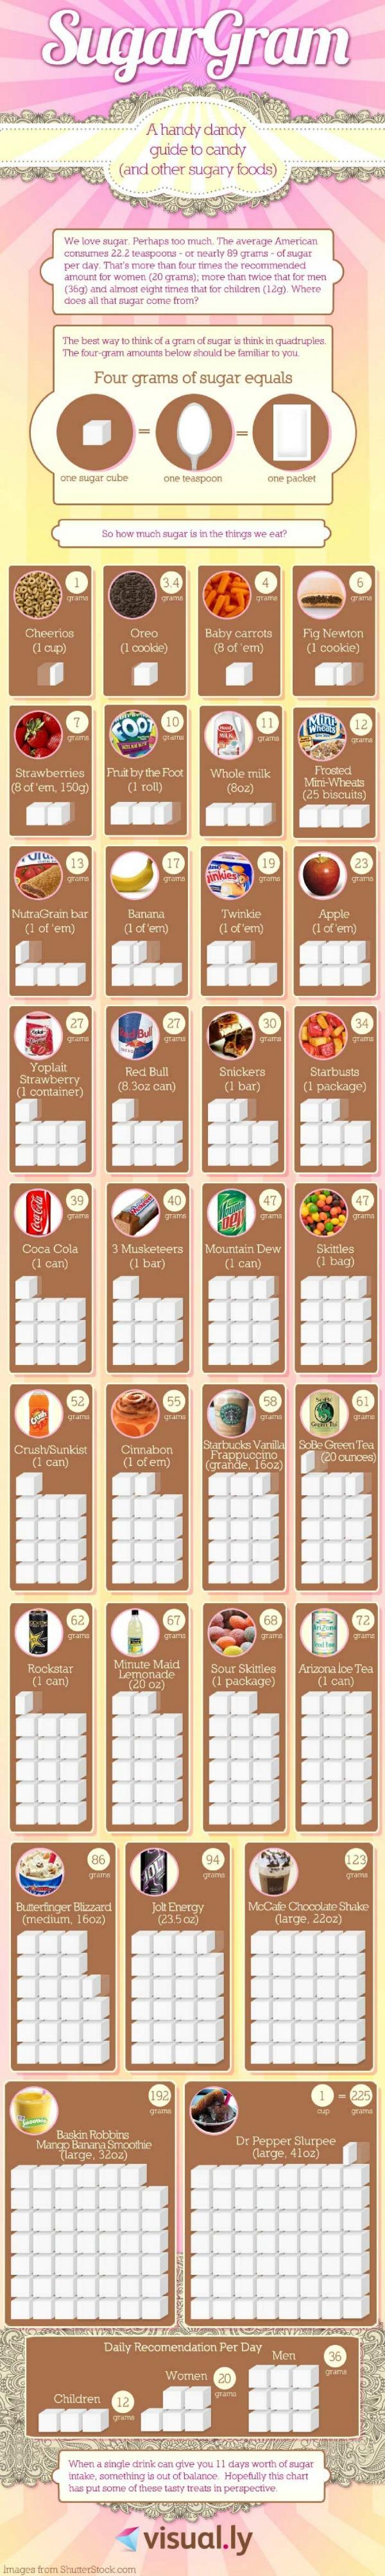 sugar-content-food